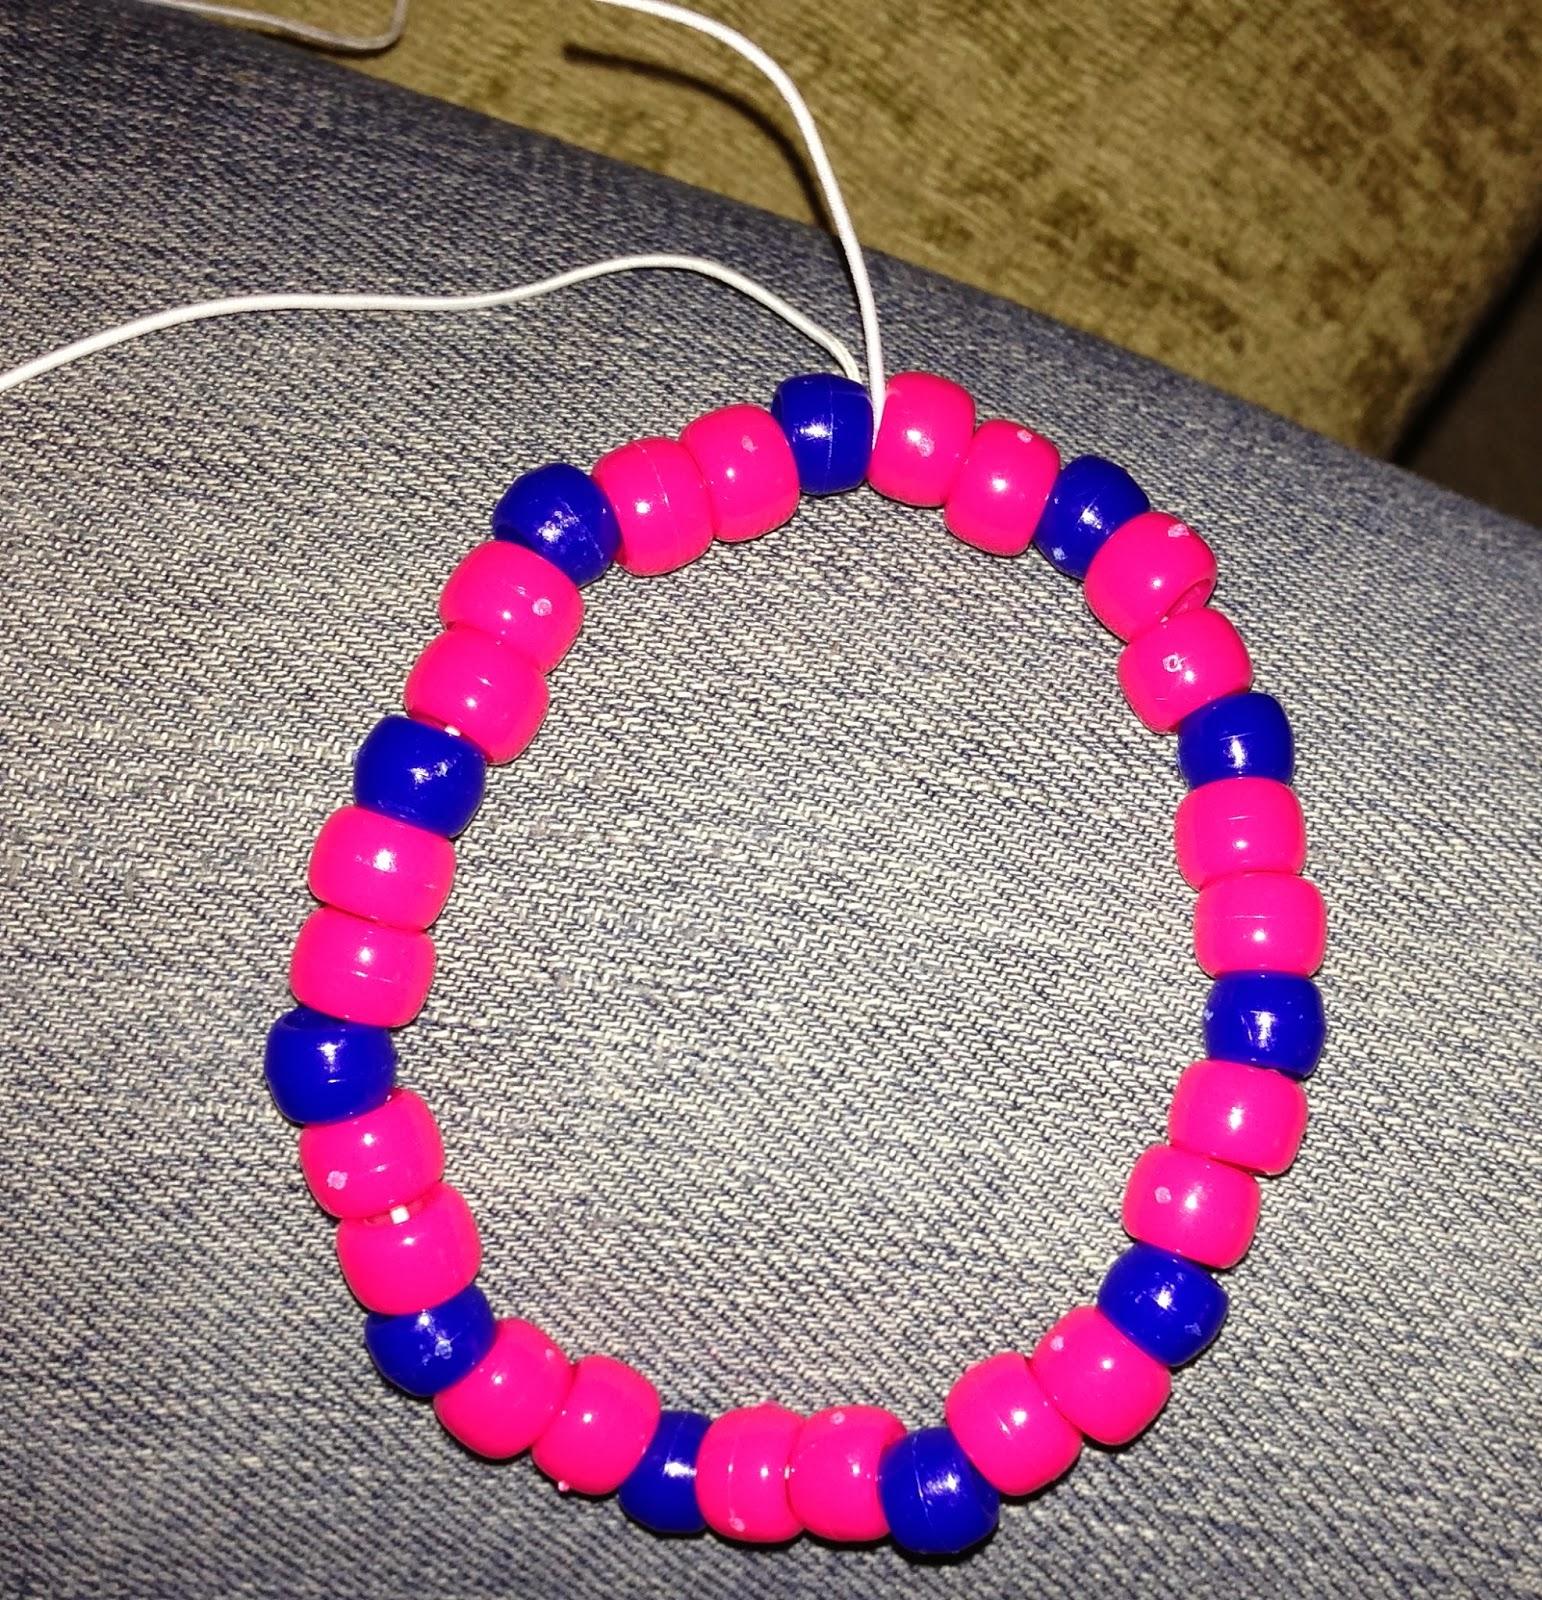 Kandi Bracelet Patterns Magnificent Decorating